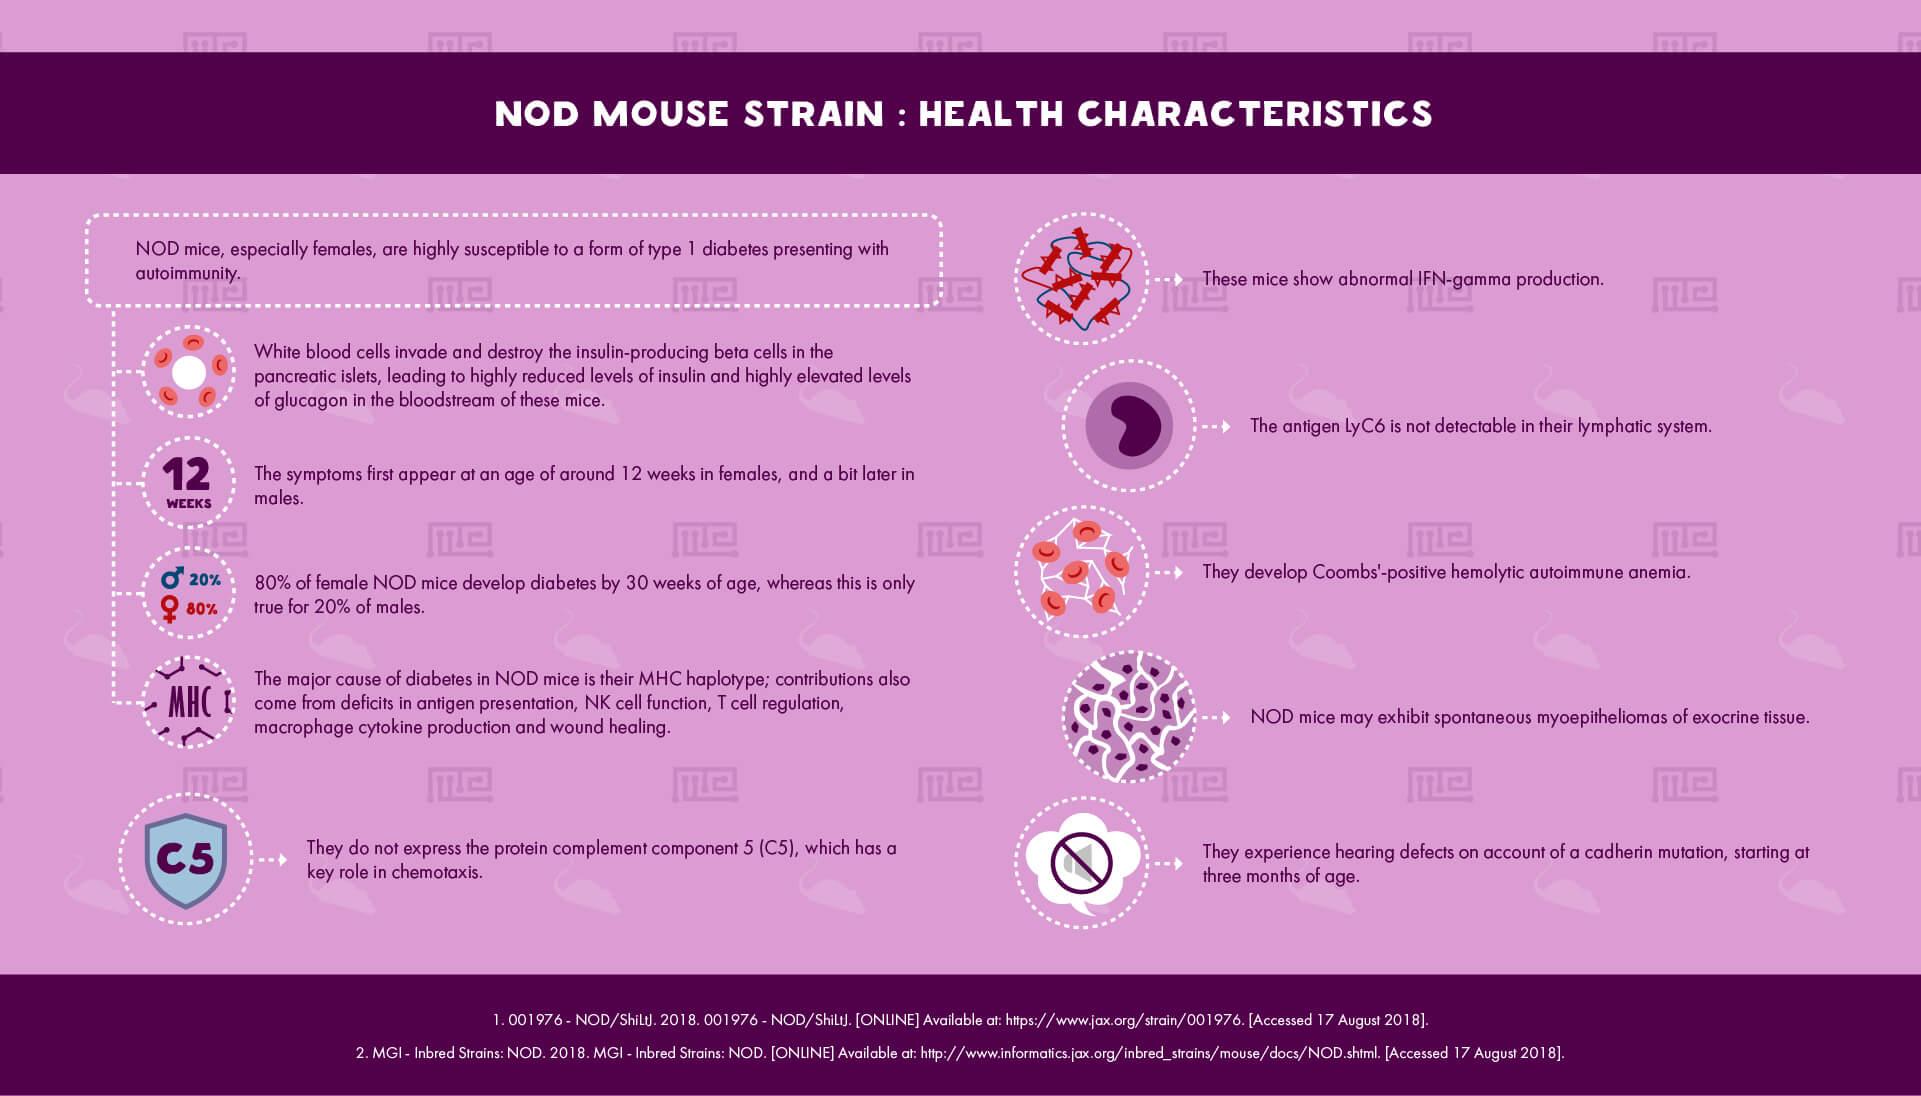 NOD Mouse Strain Health Characteristics